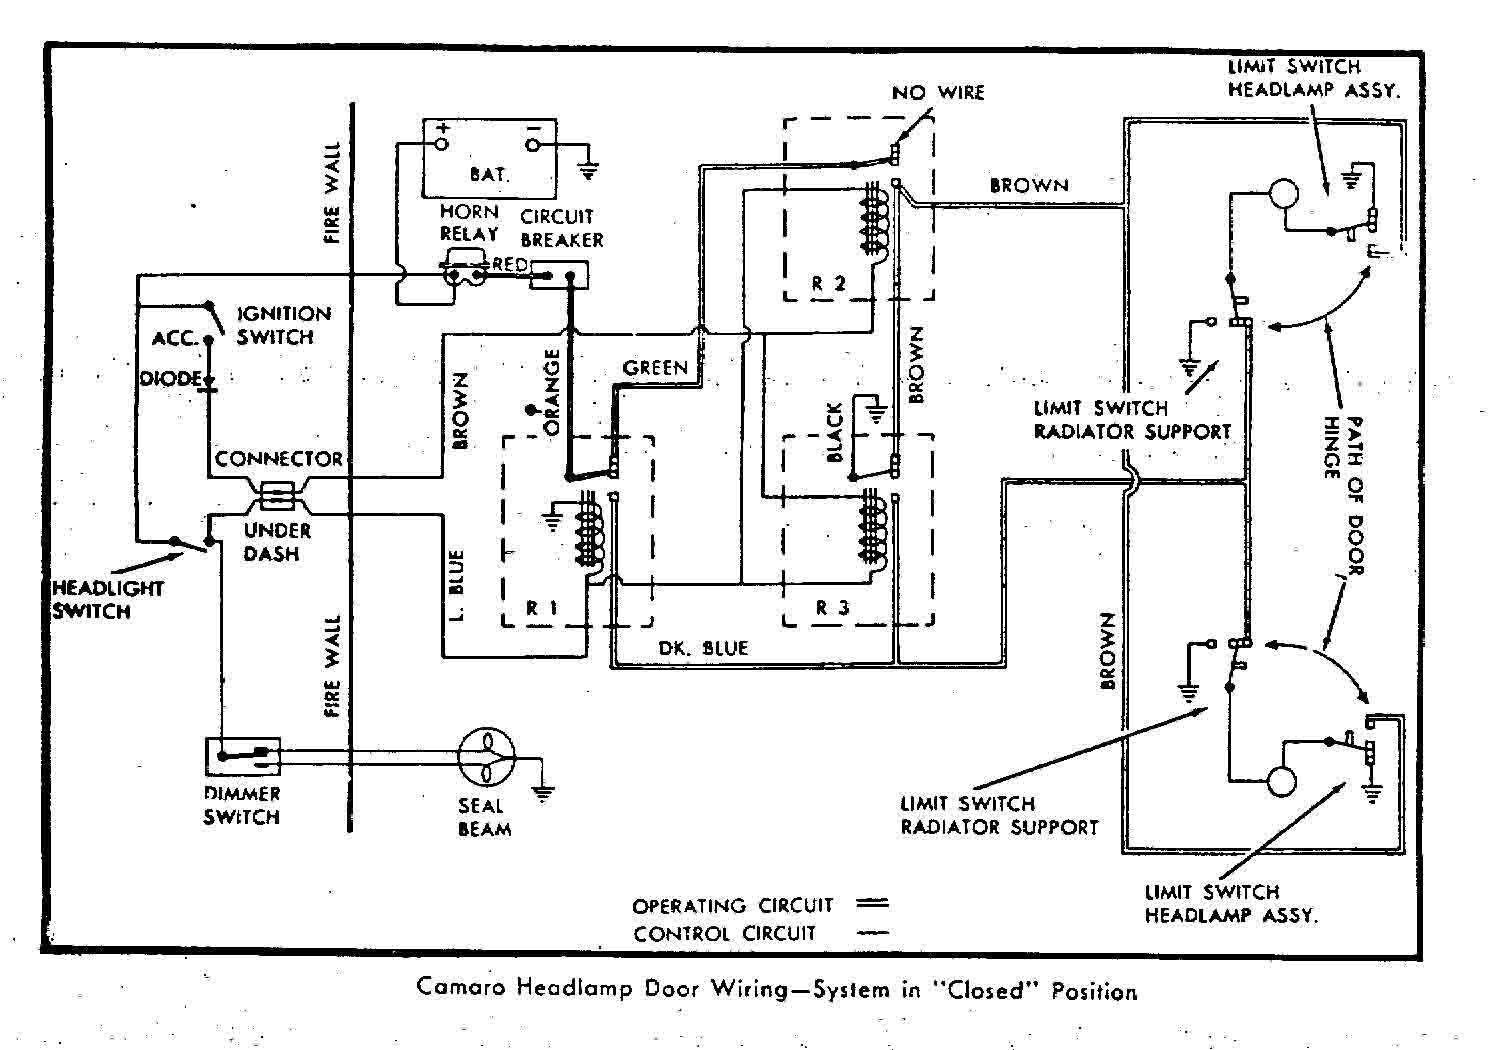 1967 Camaro Tach Wiring -Utility Trailer Brake Wiring Diagrams | Bege Place Wiring  DiagramBege Place Wiring Diagram